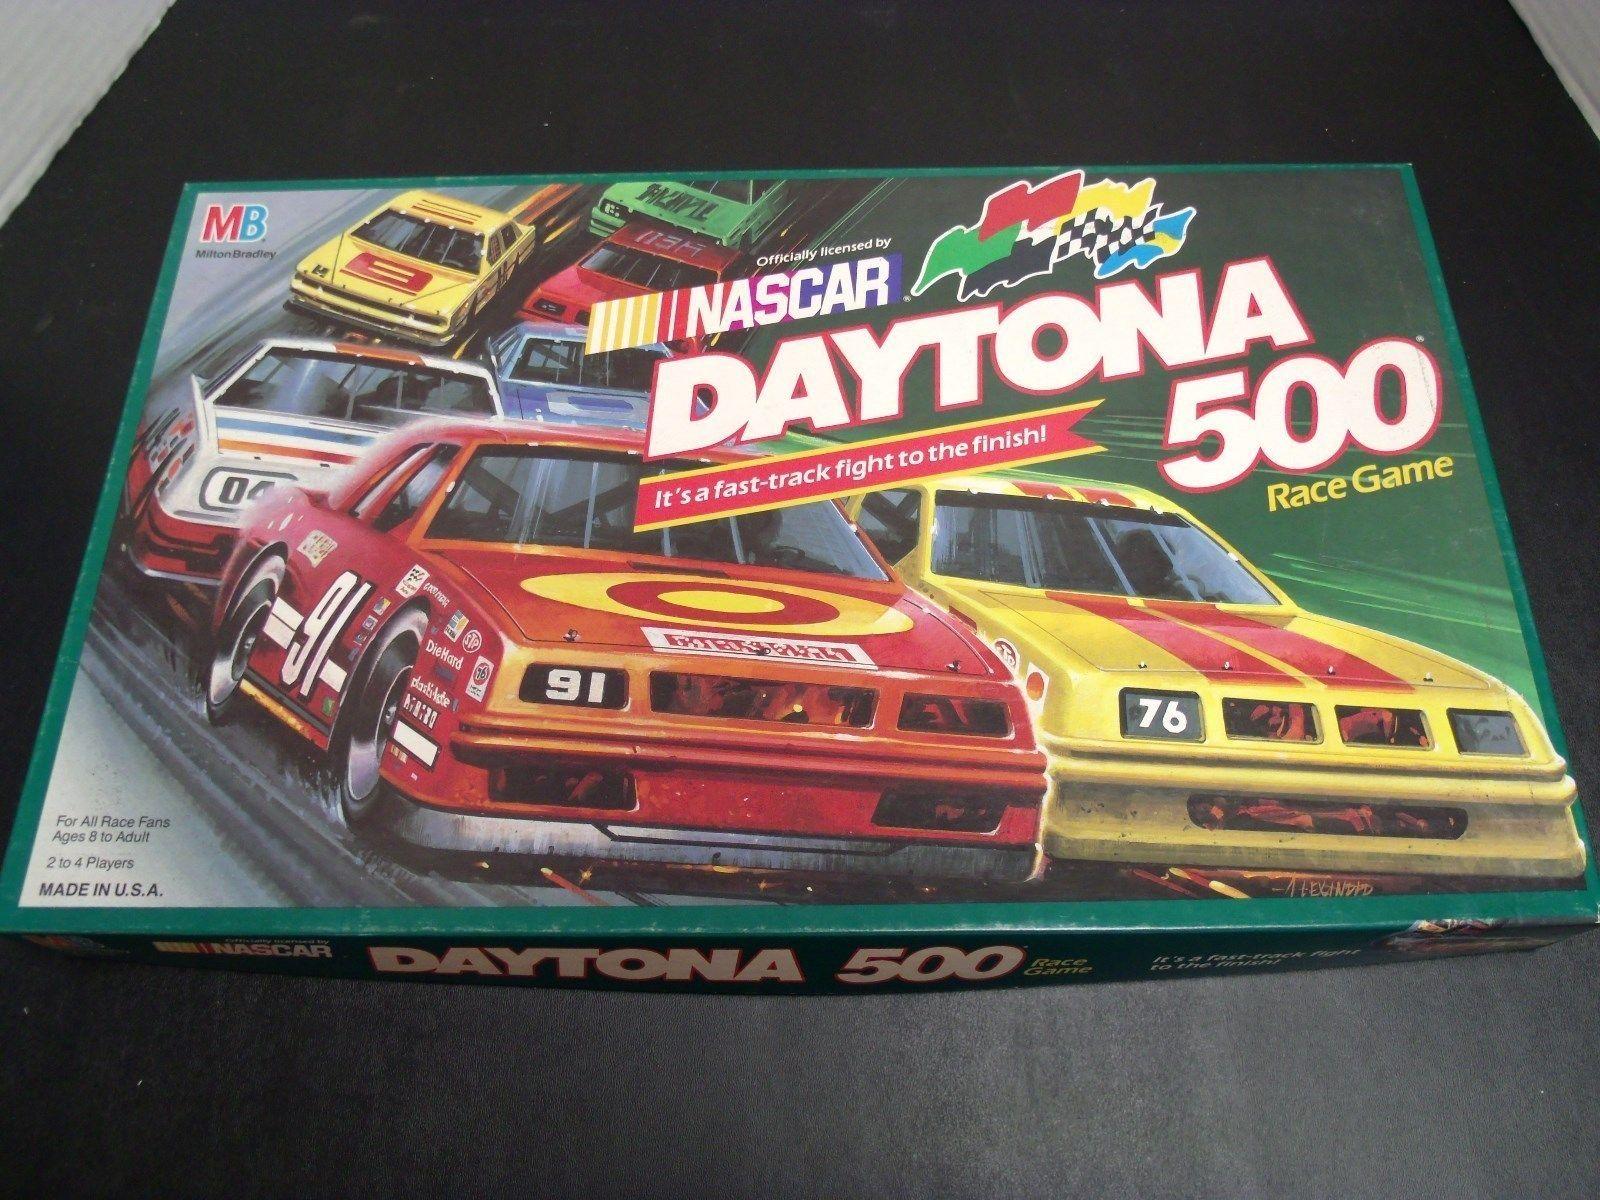 Vintage Nascar Daytona 500 Race Game Nascar daytona 500